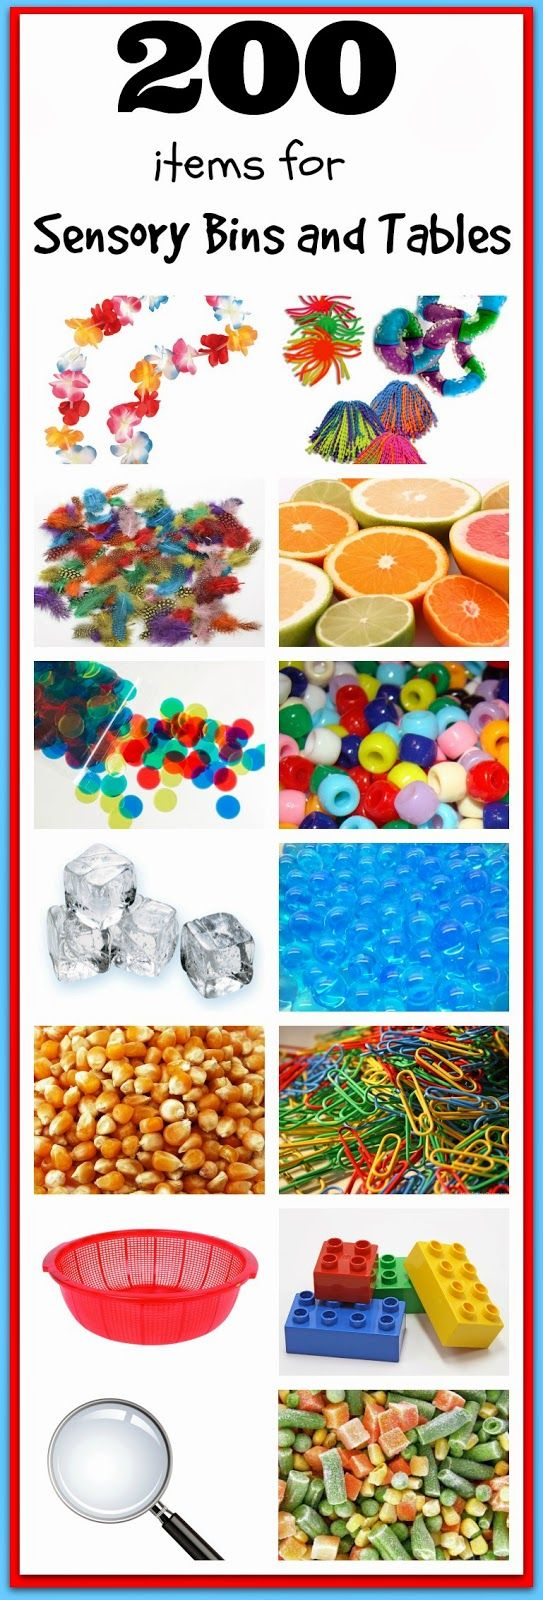 200 items for Sensory Bins and Sensory Tables